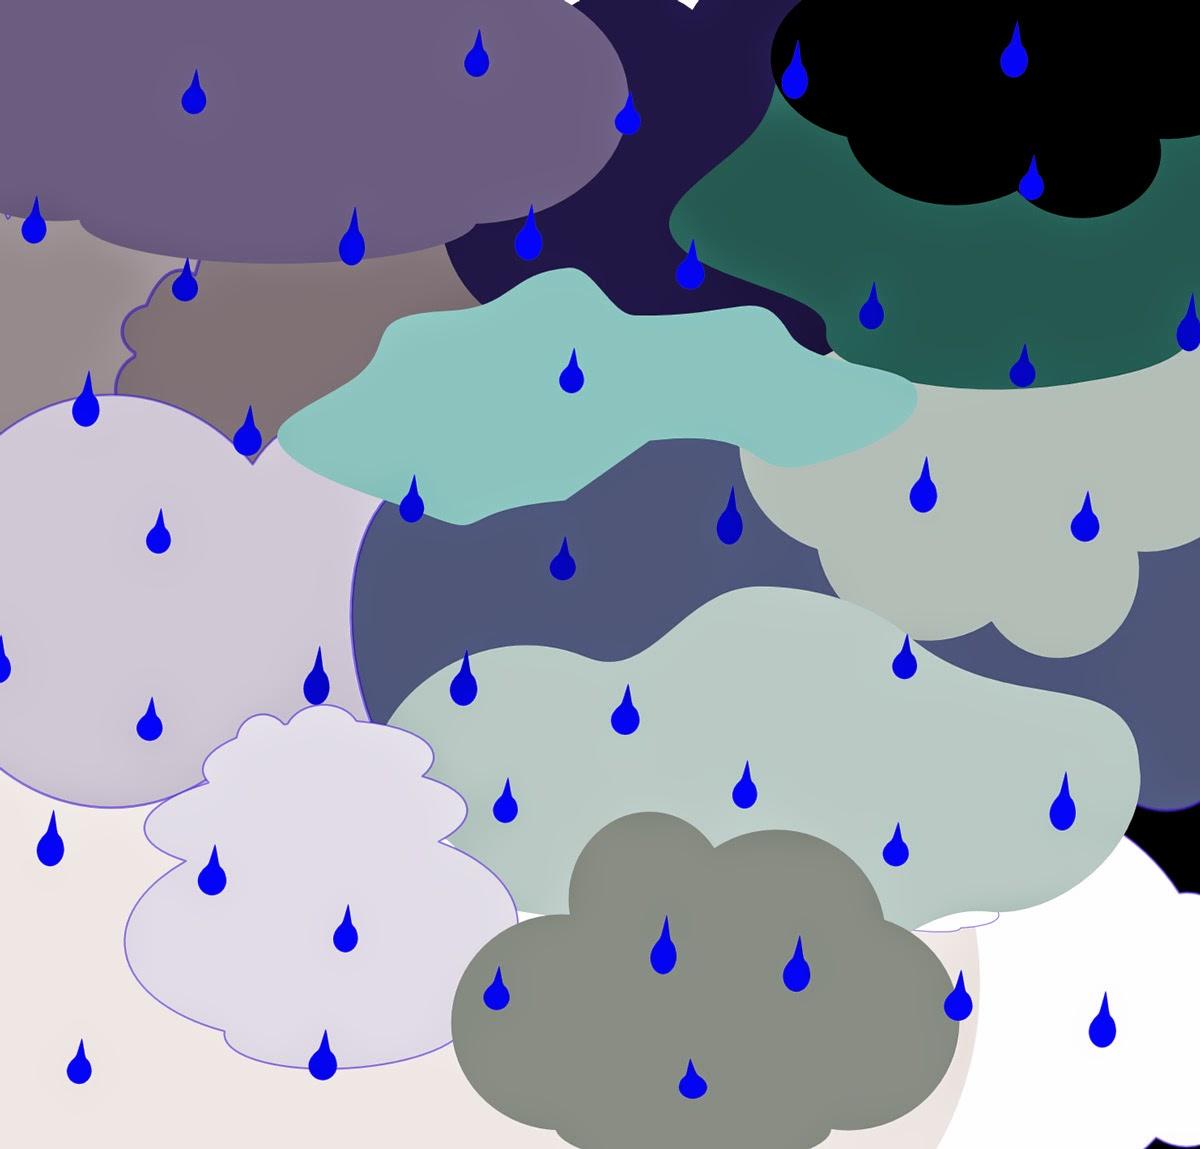 Rain, Lluvia, Pluja, Pluie, Regen, 雨